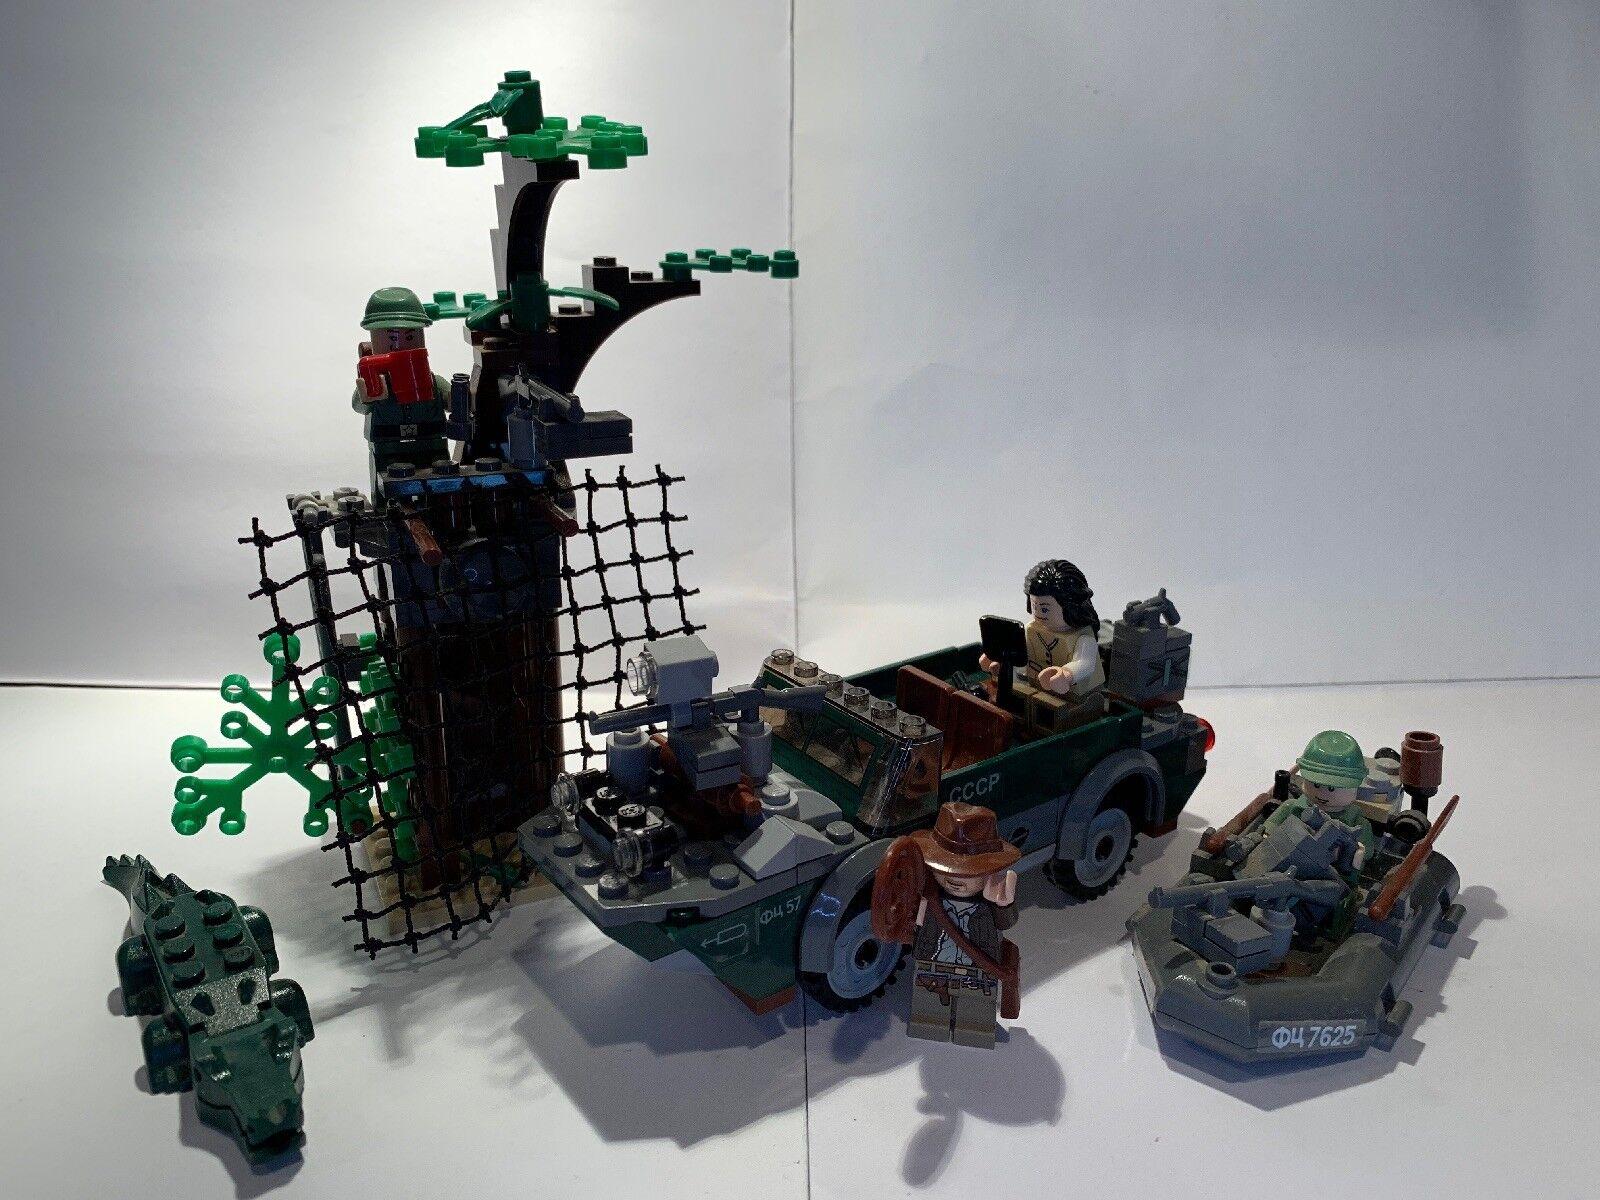 Lego indiana jones fluss chase 7625